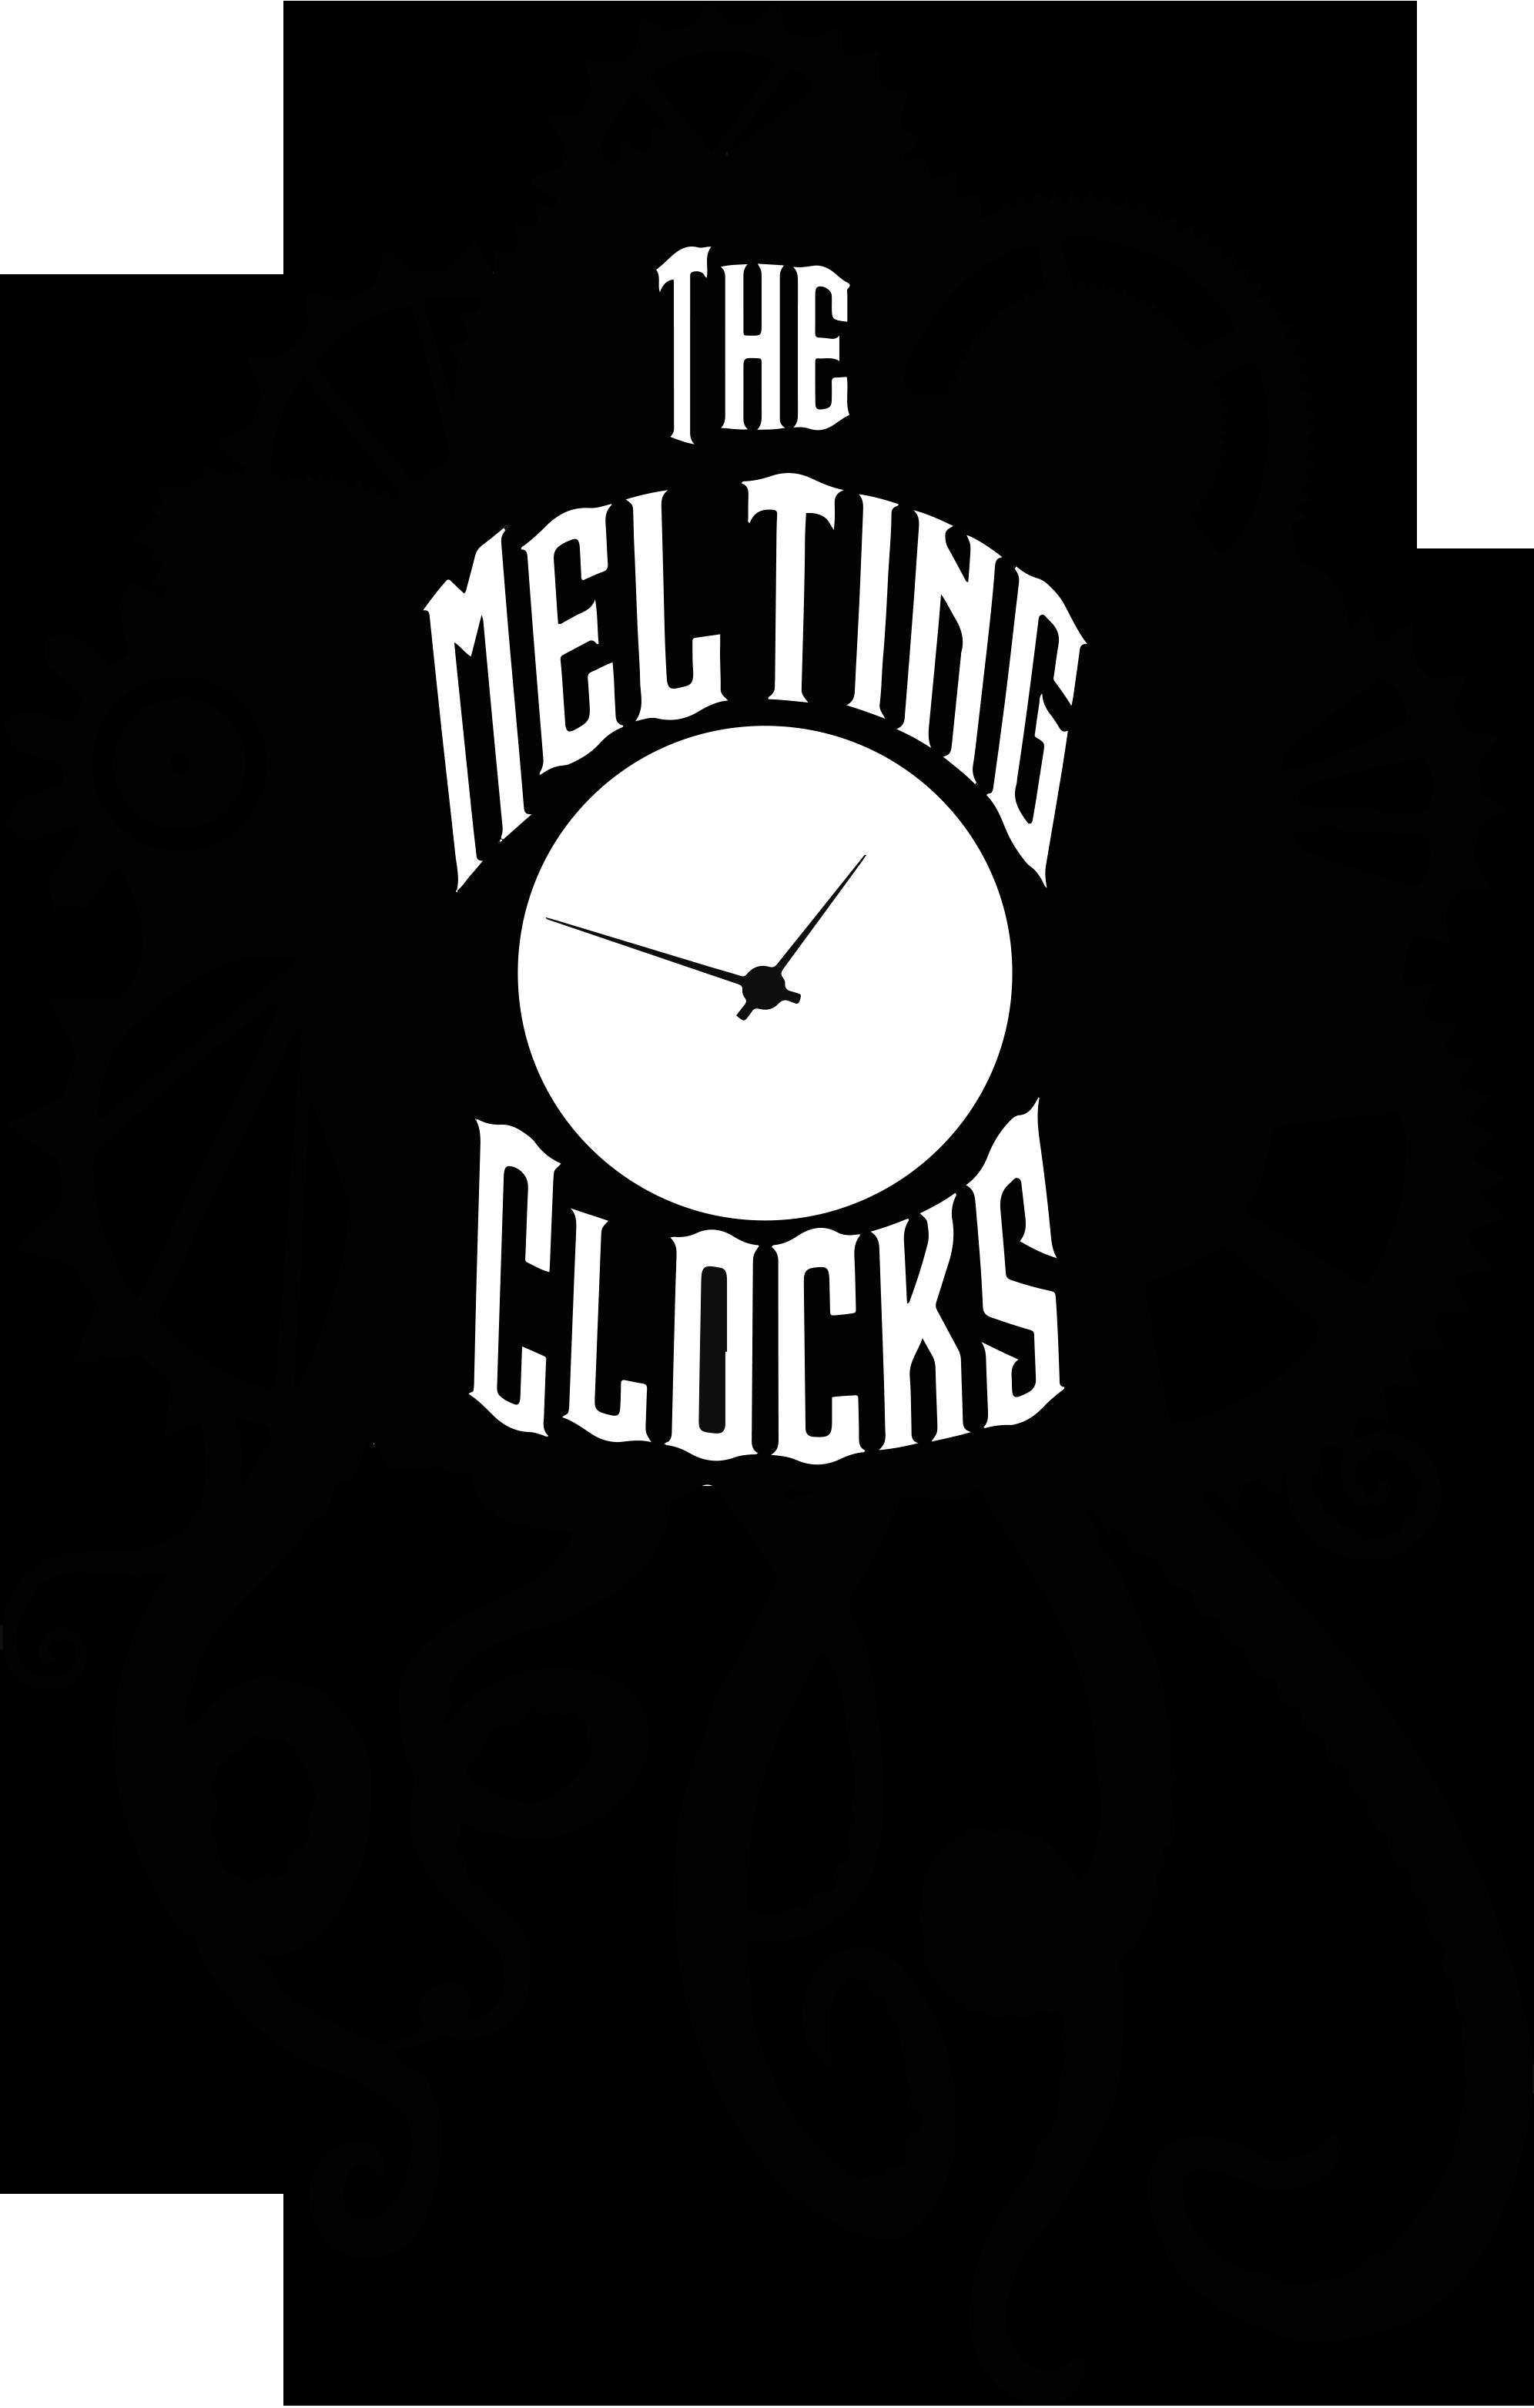 Melting-Clock-Logo.png (1992×3126)